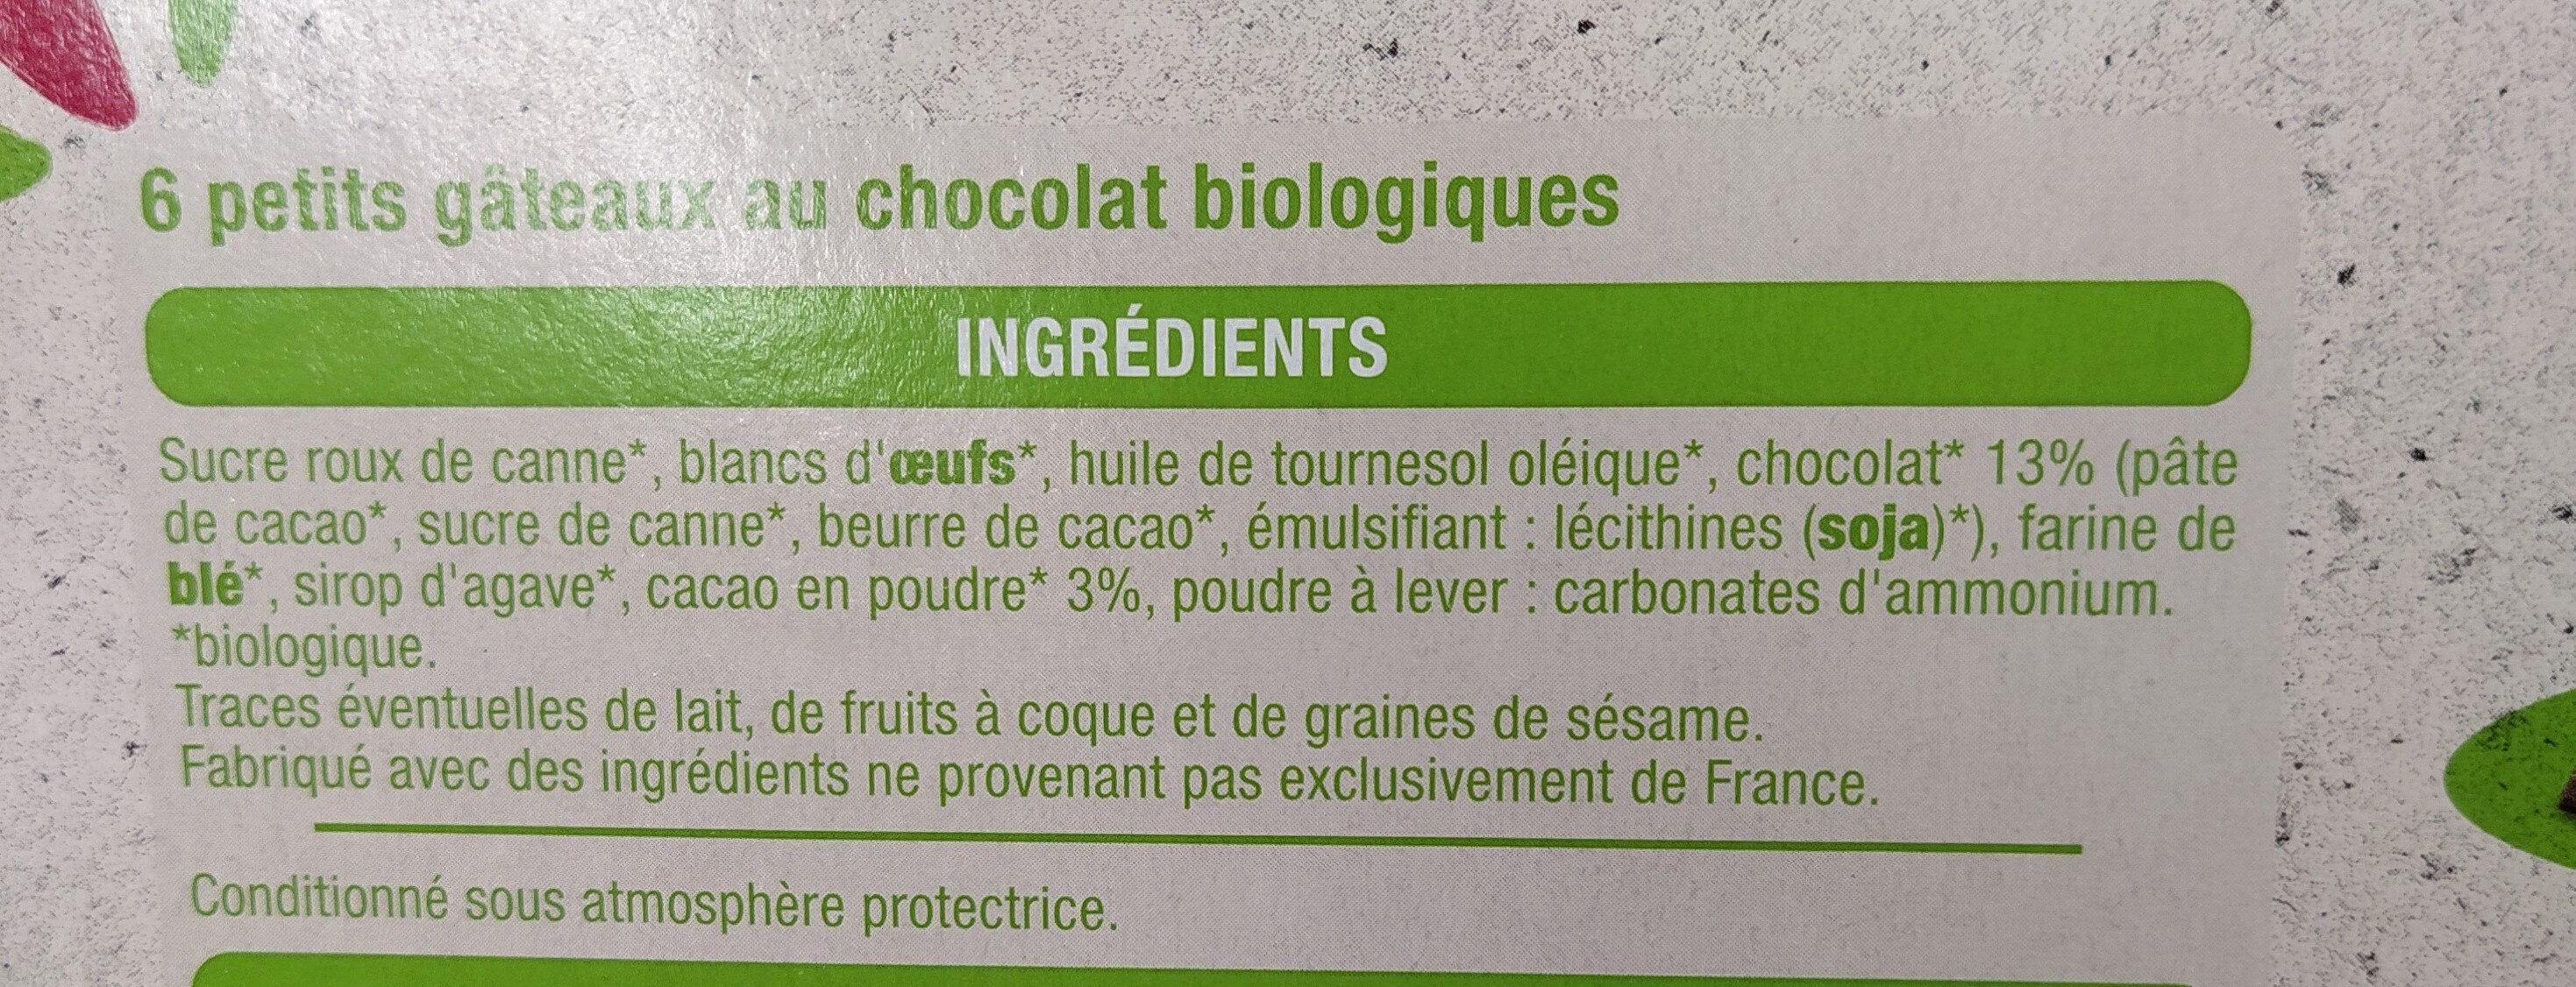 Moelleux au chocolat bio - Ingredienti - fr